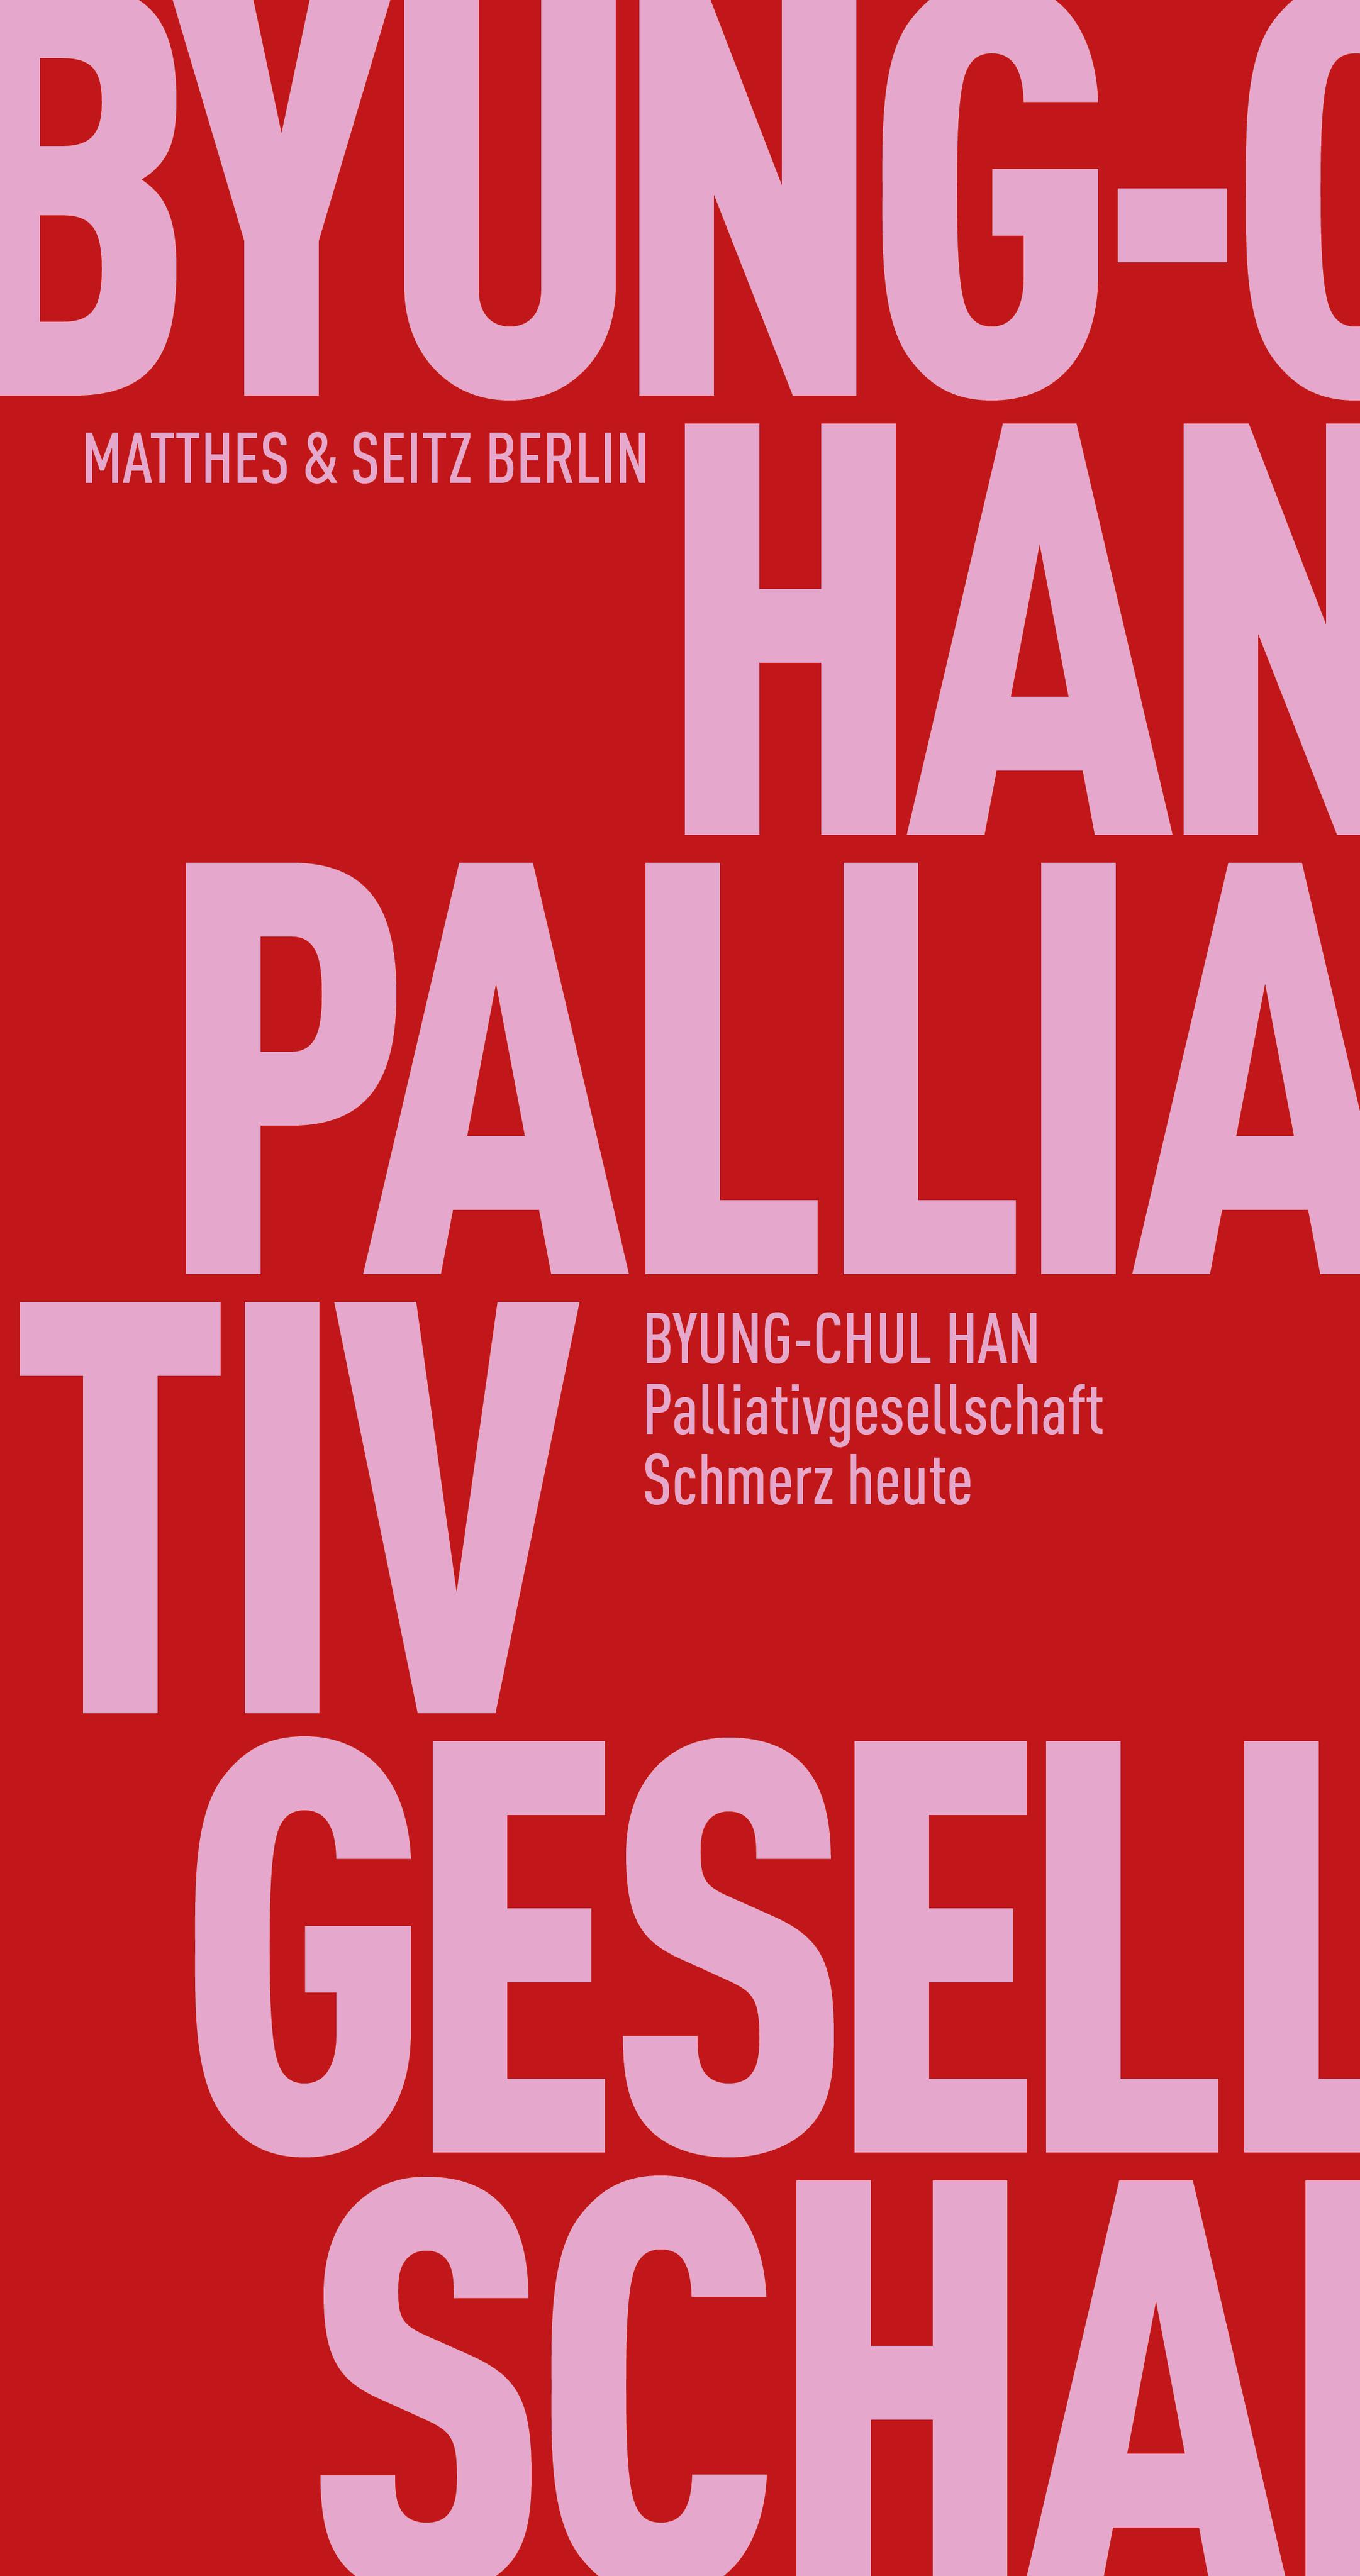 Palliativgesellschaft